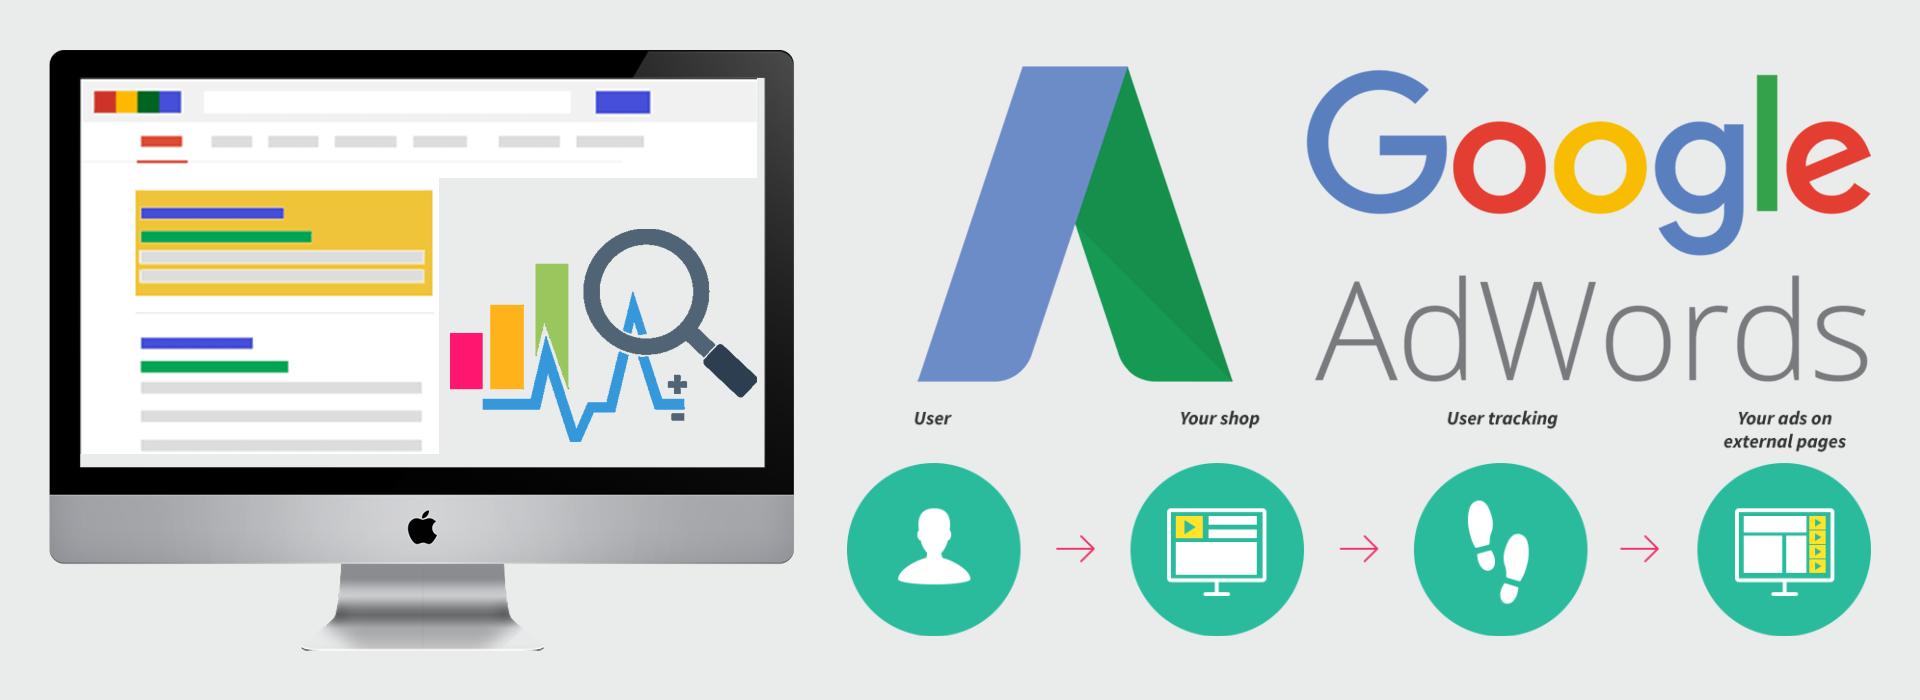 google-adwords-banner